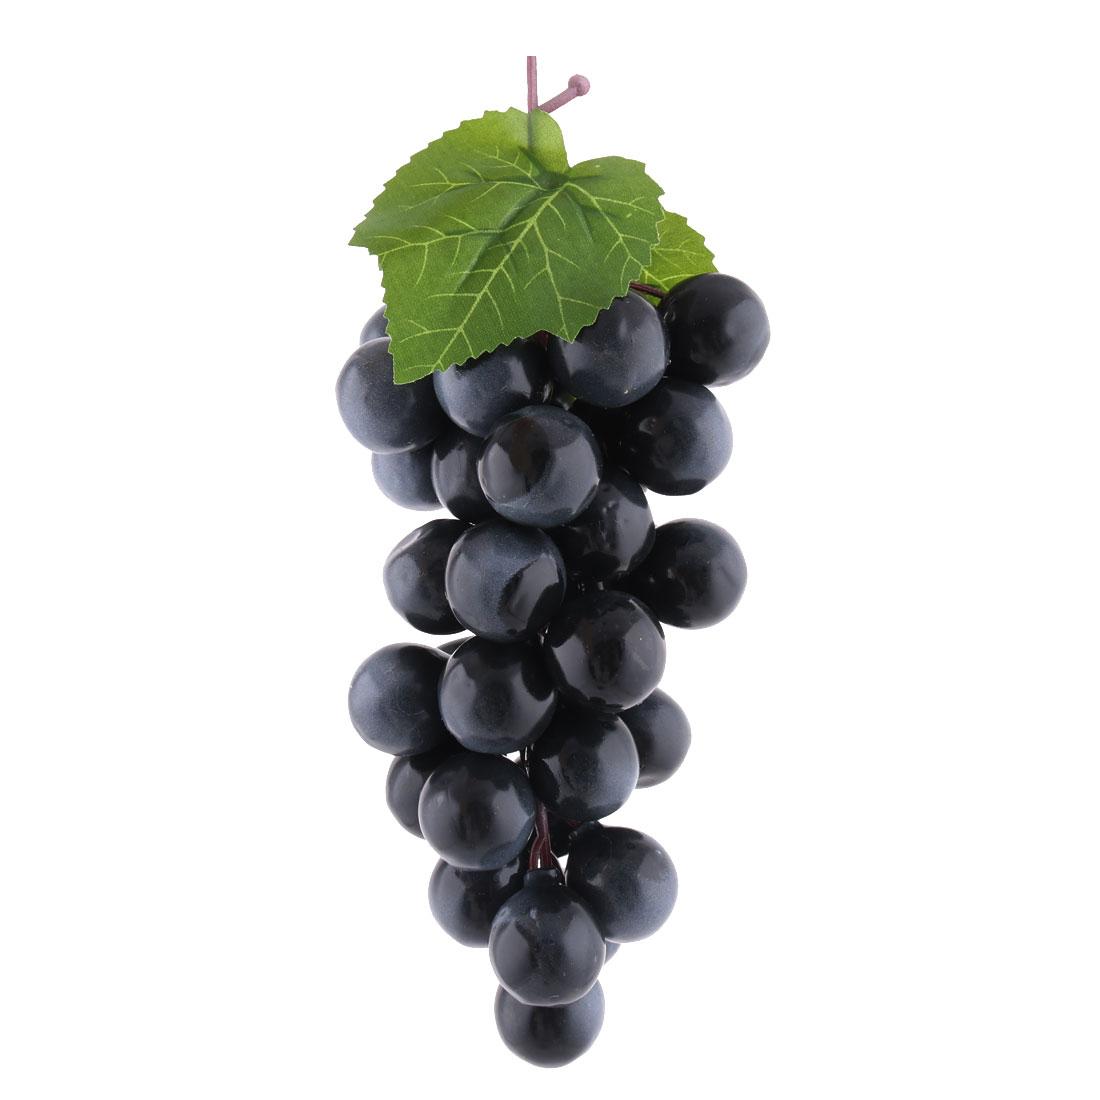 Home Party Decoration Plastic Manmade Simulation Artificial Fruit Grape Black